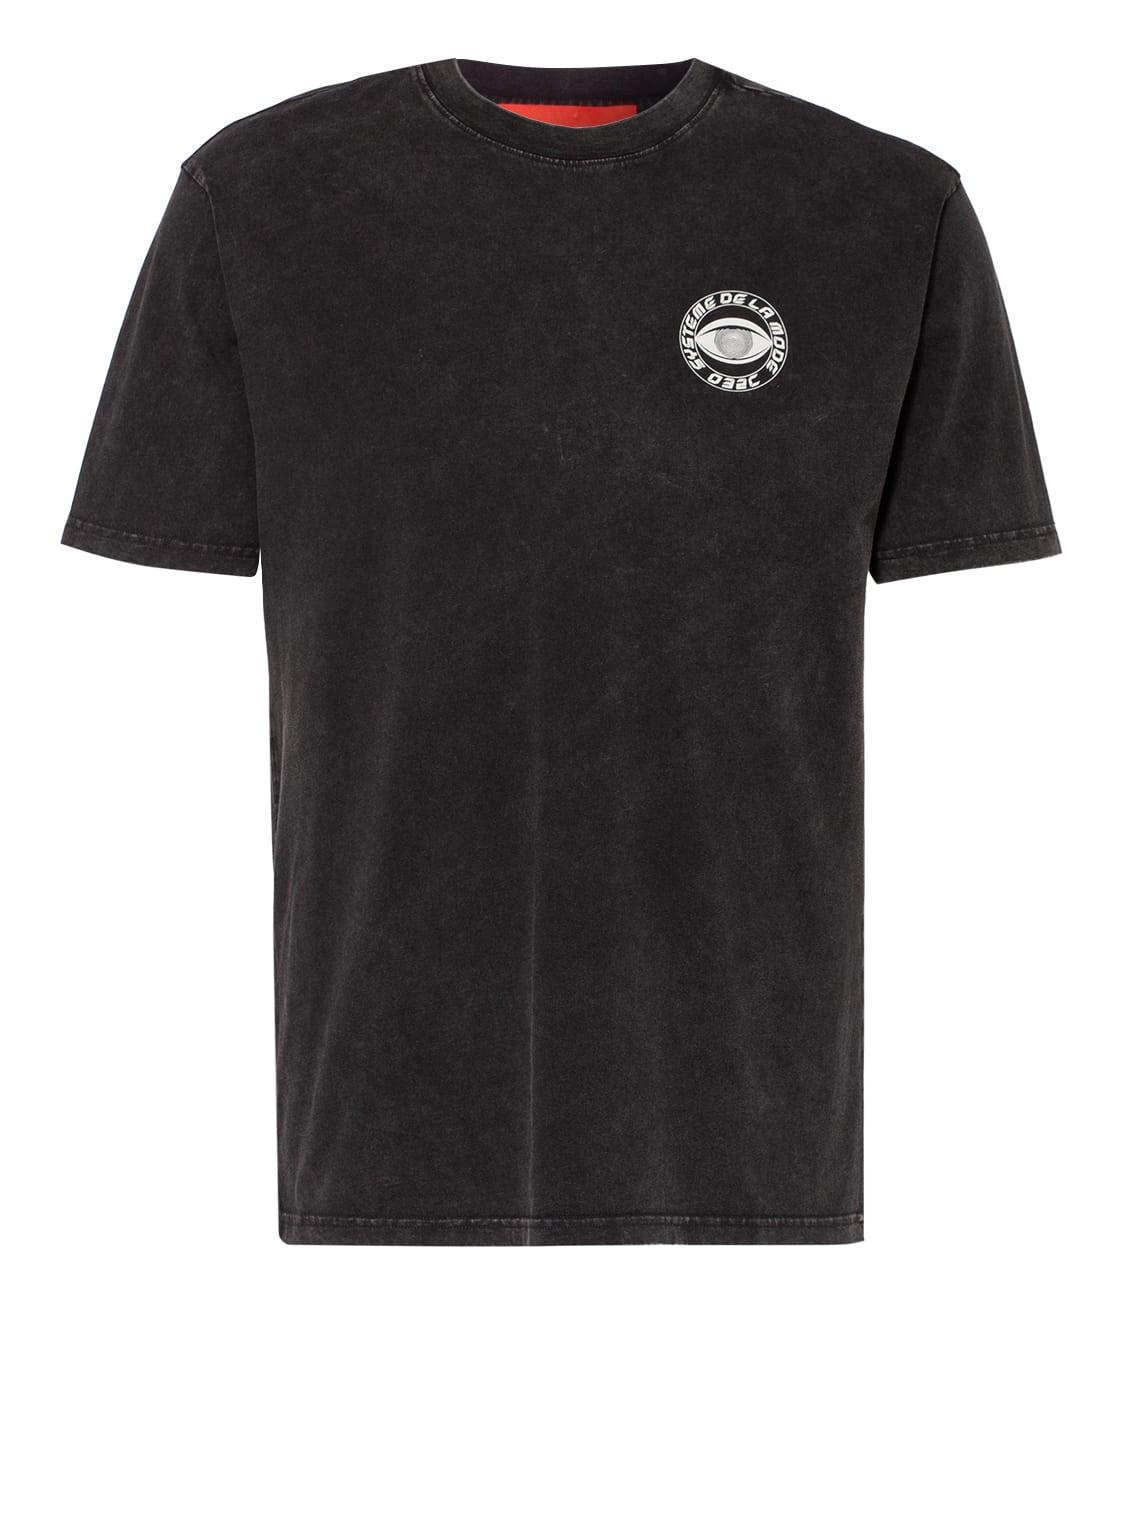 Image of 032c T-Shirt Hypnos schwarz